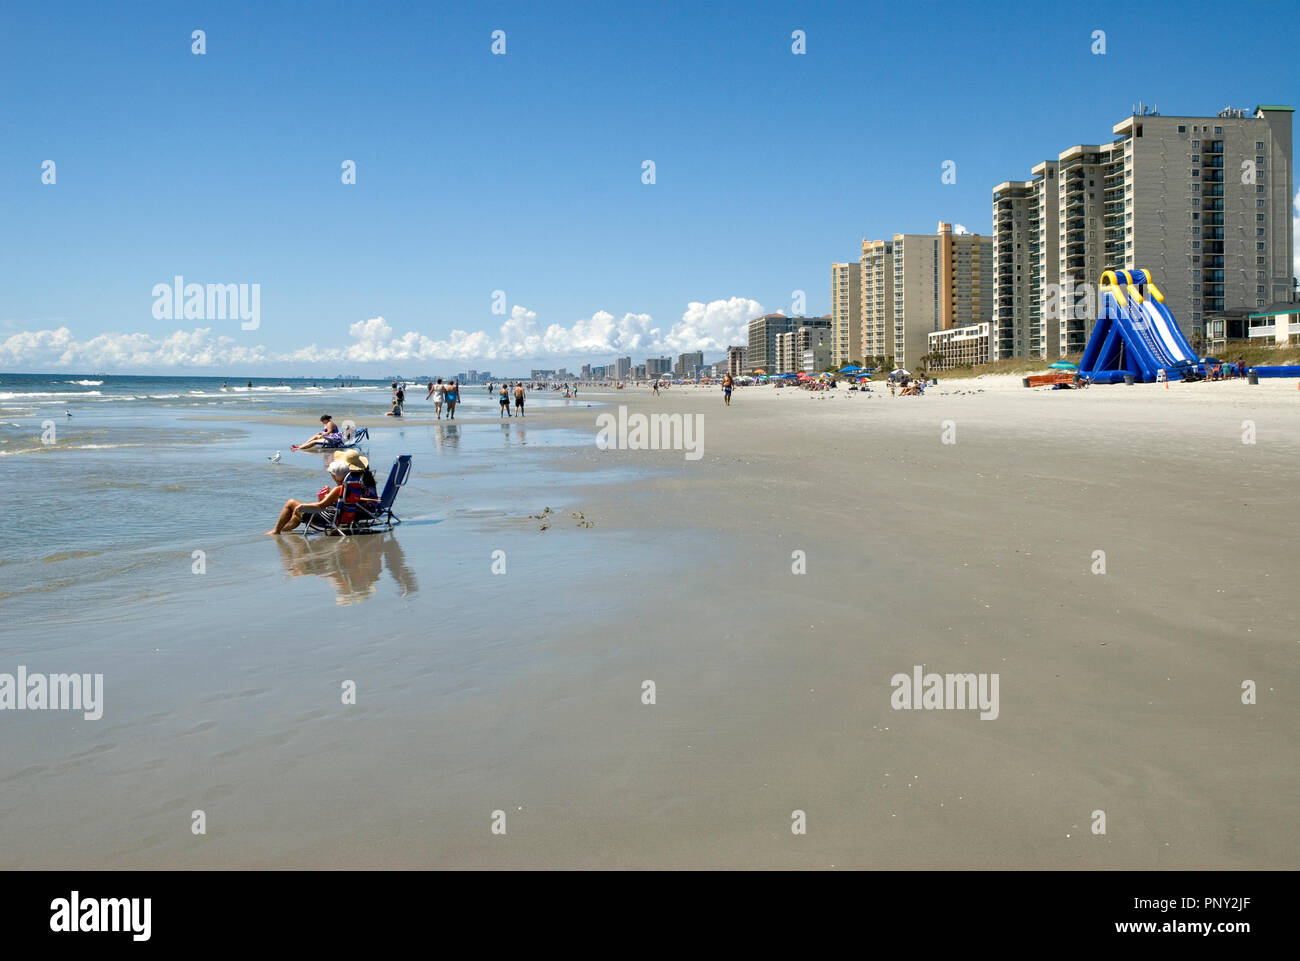 North Myrtle Beach South Carolina USA - Stock Image